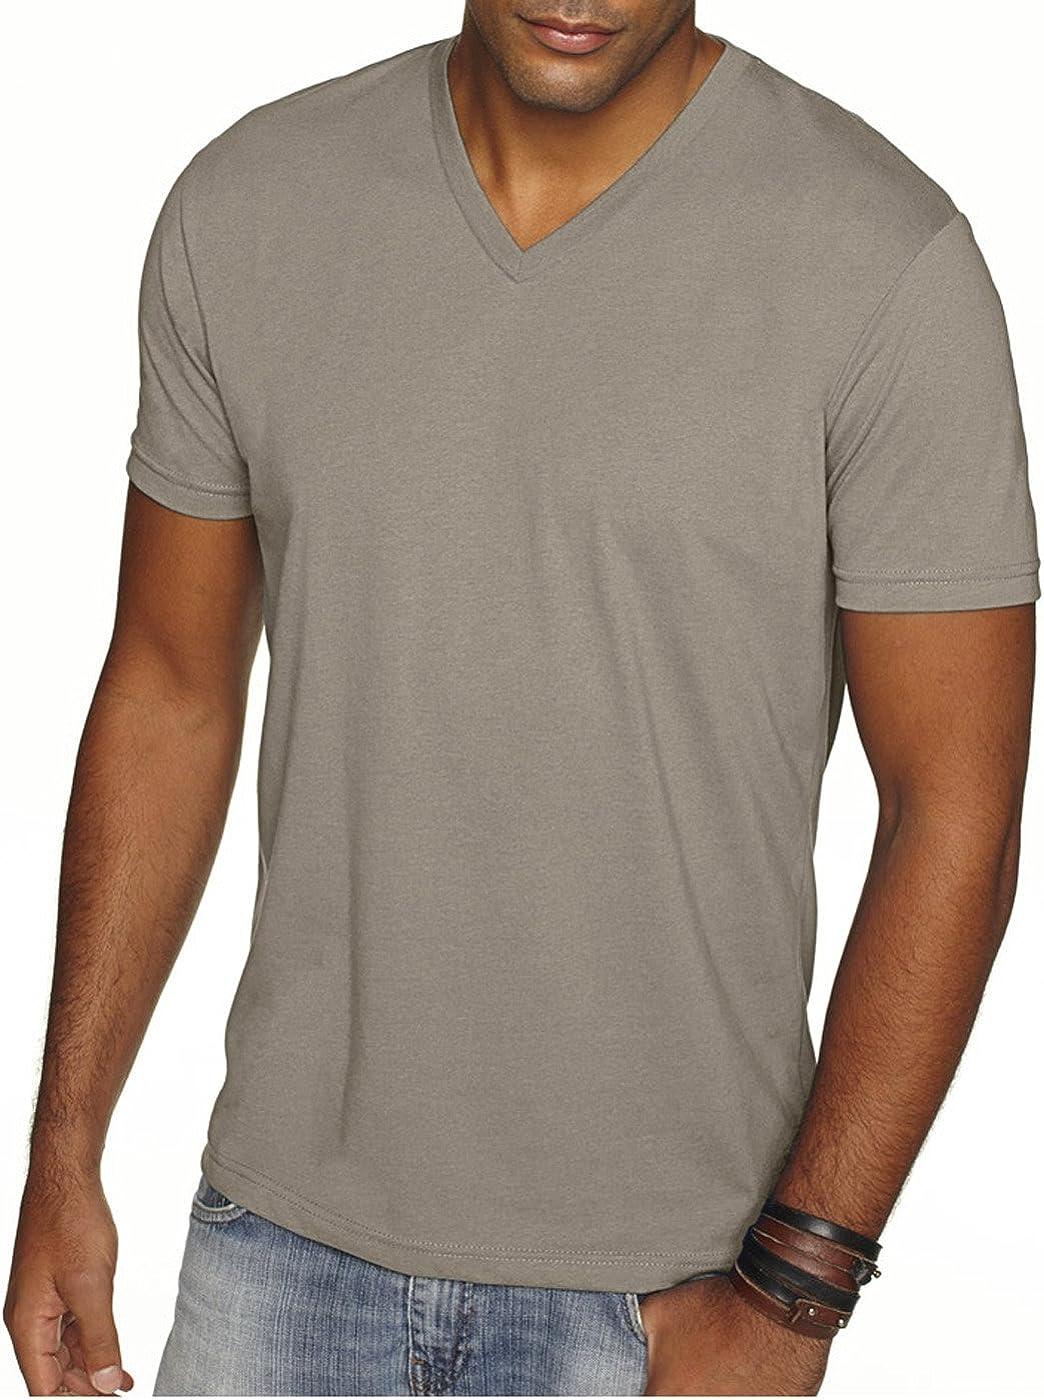 Banana Cream Next Level Mens Premium Sueded Crewneck T-Shirt